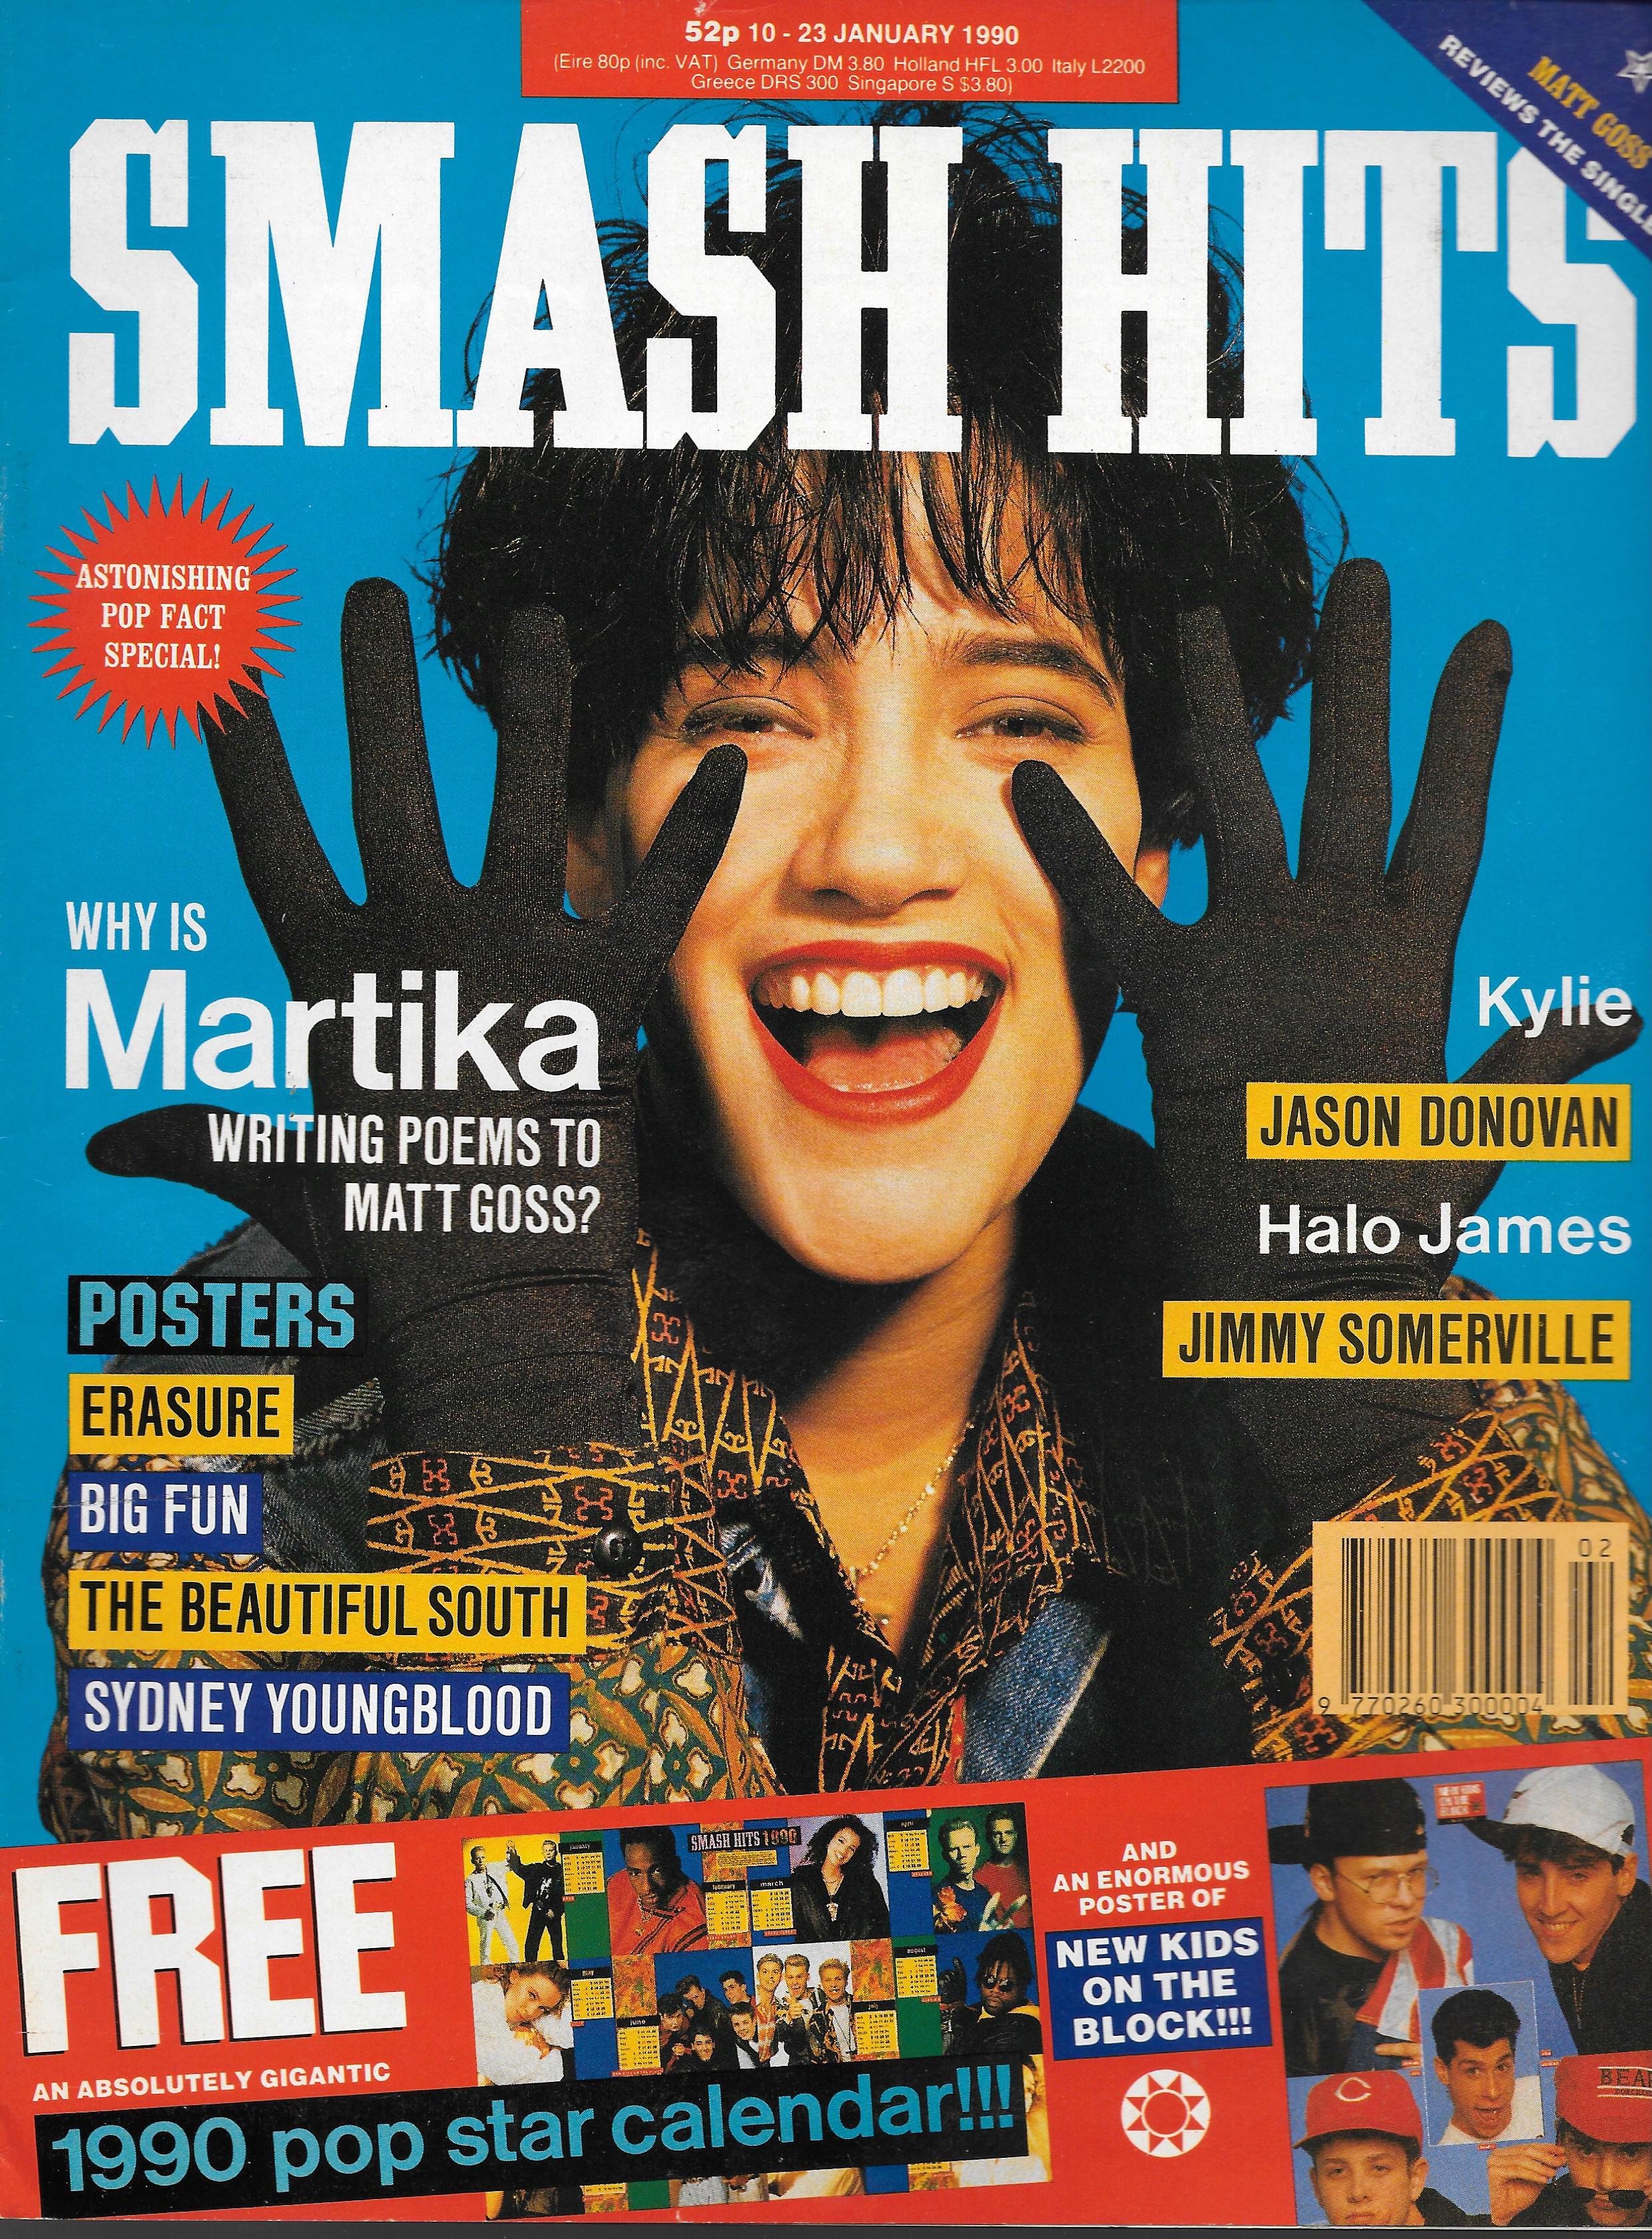 www.tilleysmagazines.com-Magazines-Comics-SMASH-HITS-14.jpg